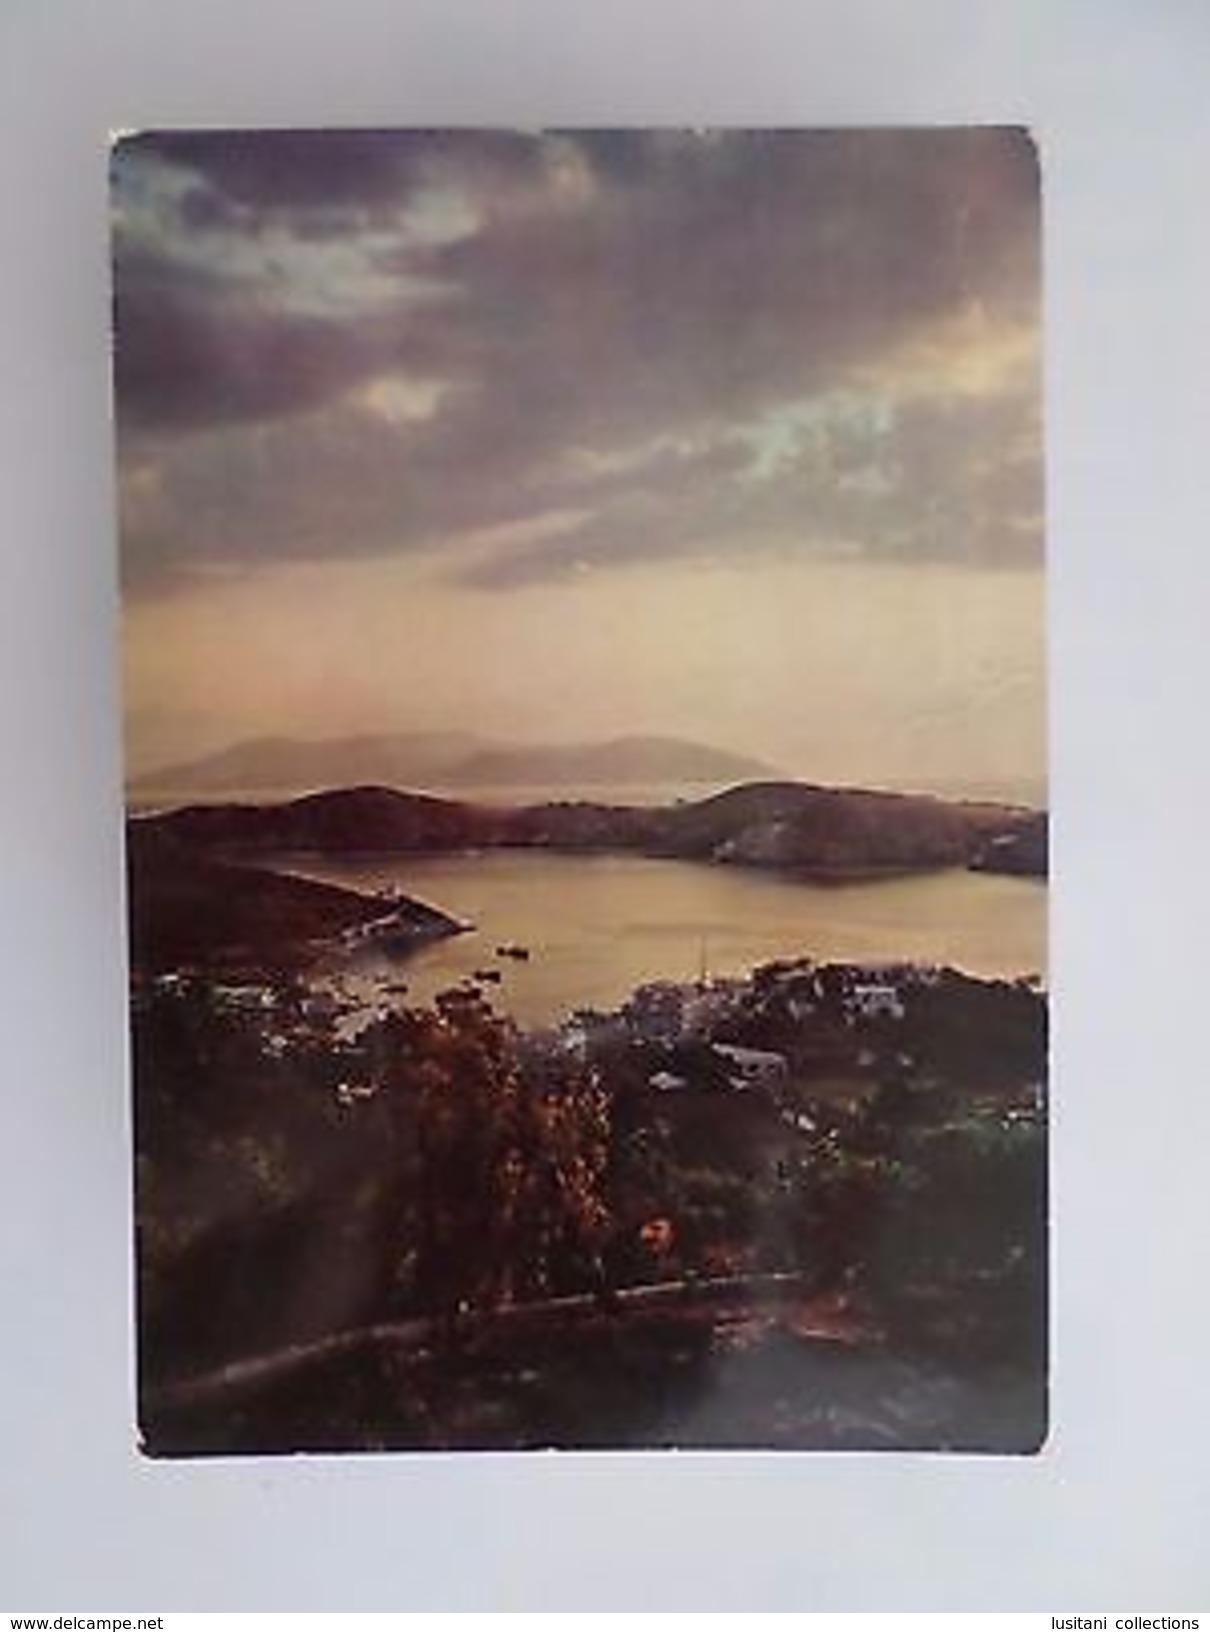 GREECE IOS SUNSET COUCHER DU SOLEIL 1960 YEARS POSTCARD Z1 - Postcards